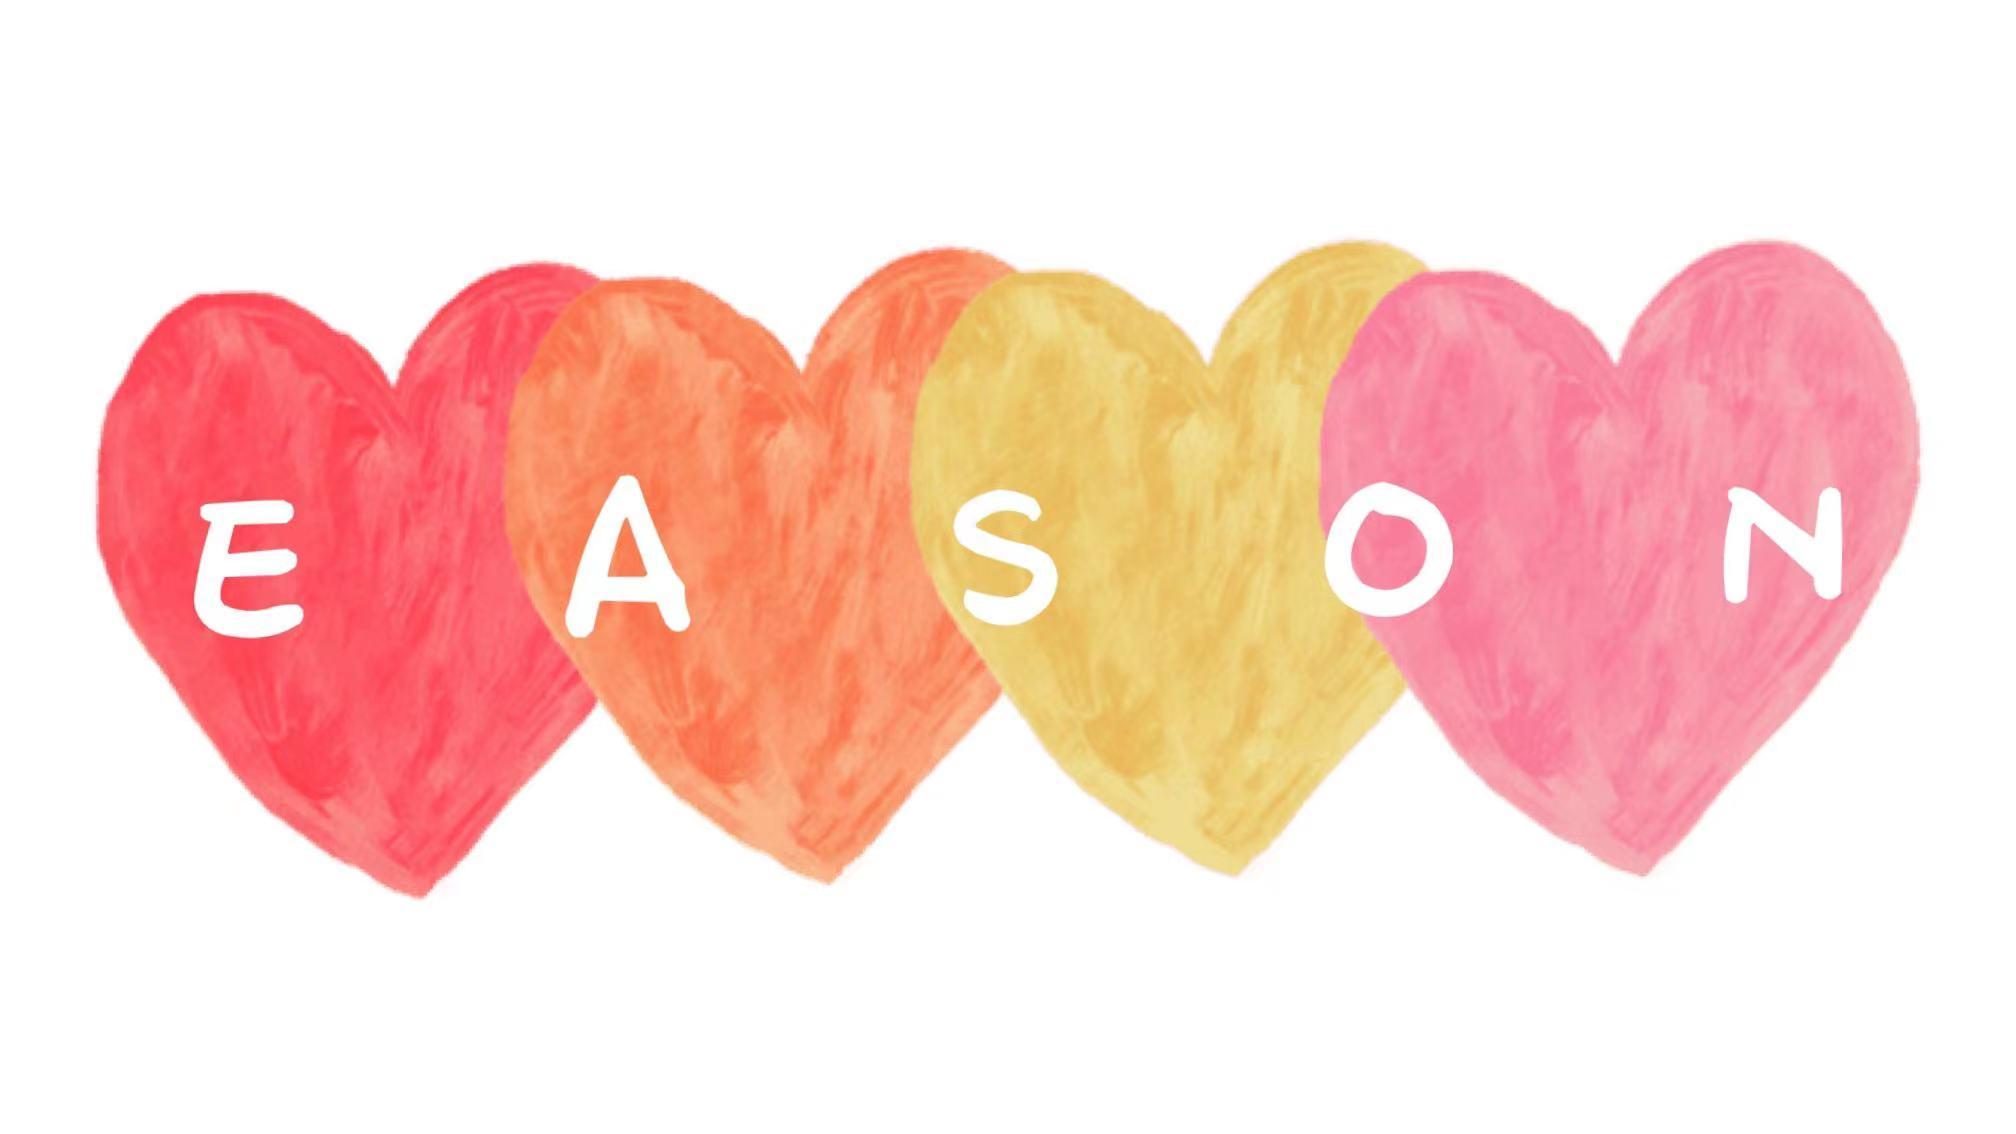 Eason Team Logo